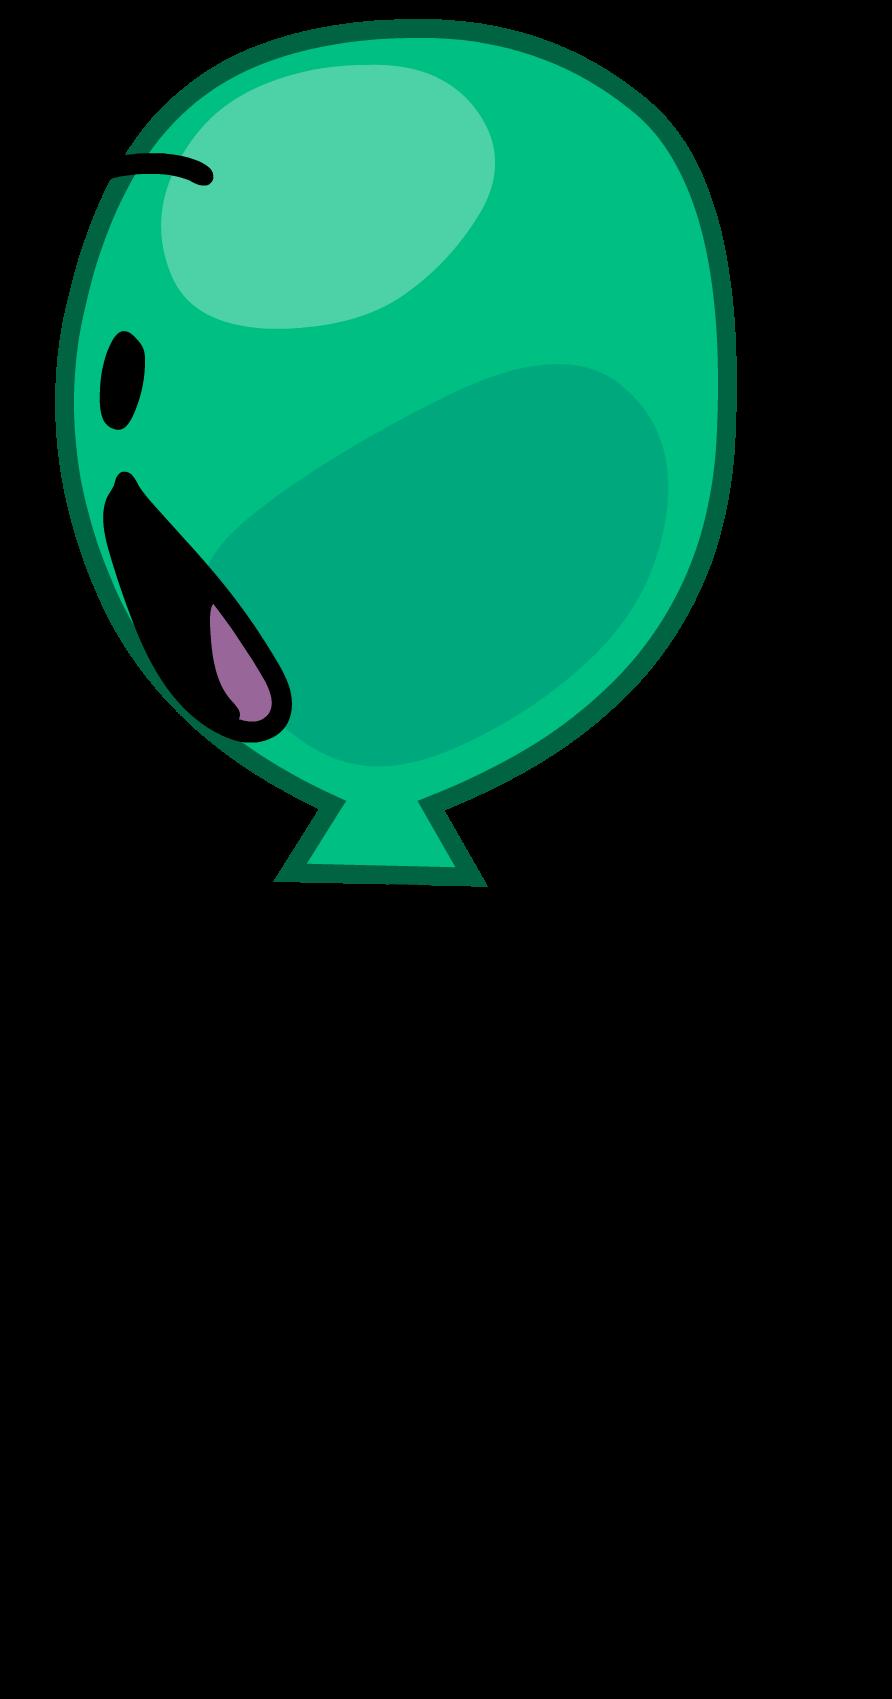 balloony battle for dream island wiki fandom powered by wikia